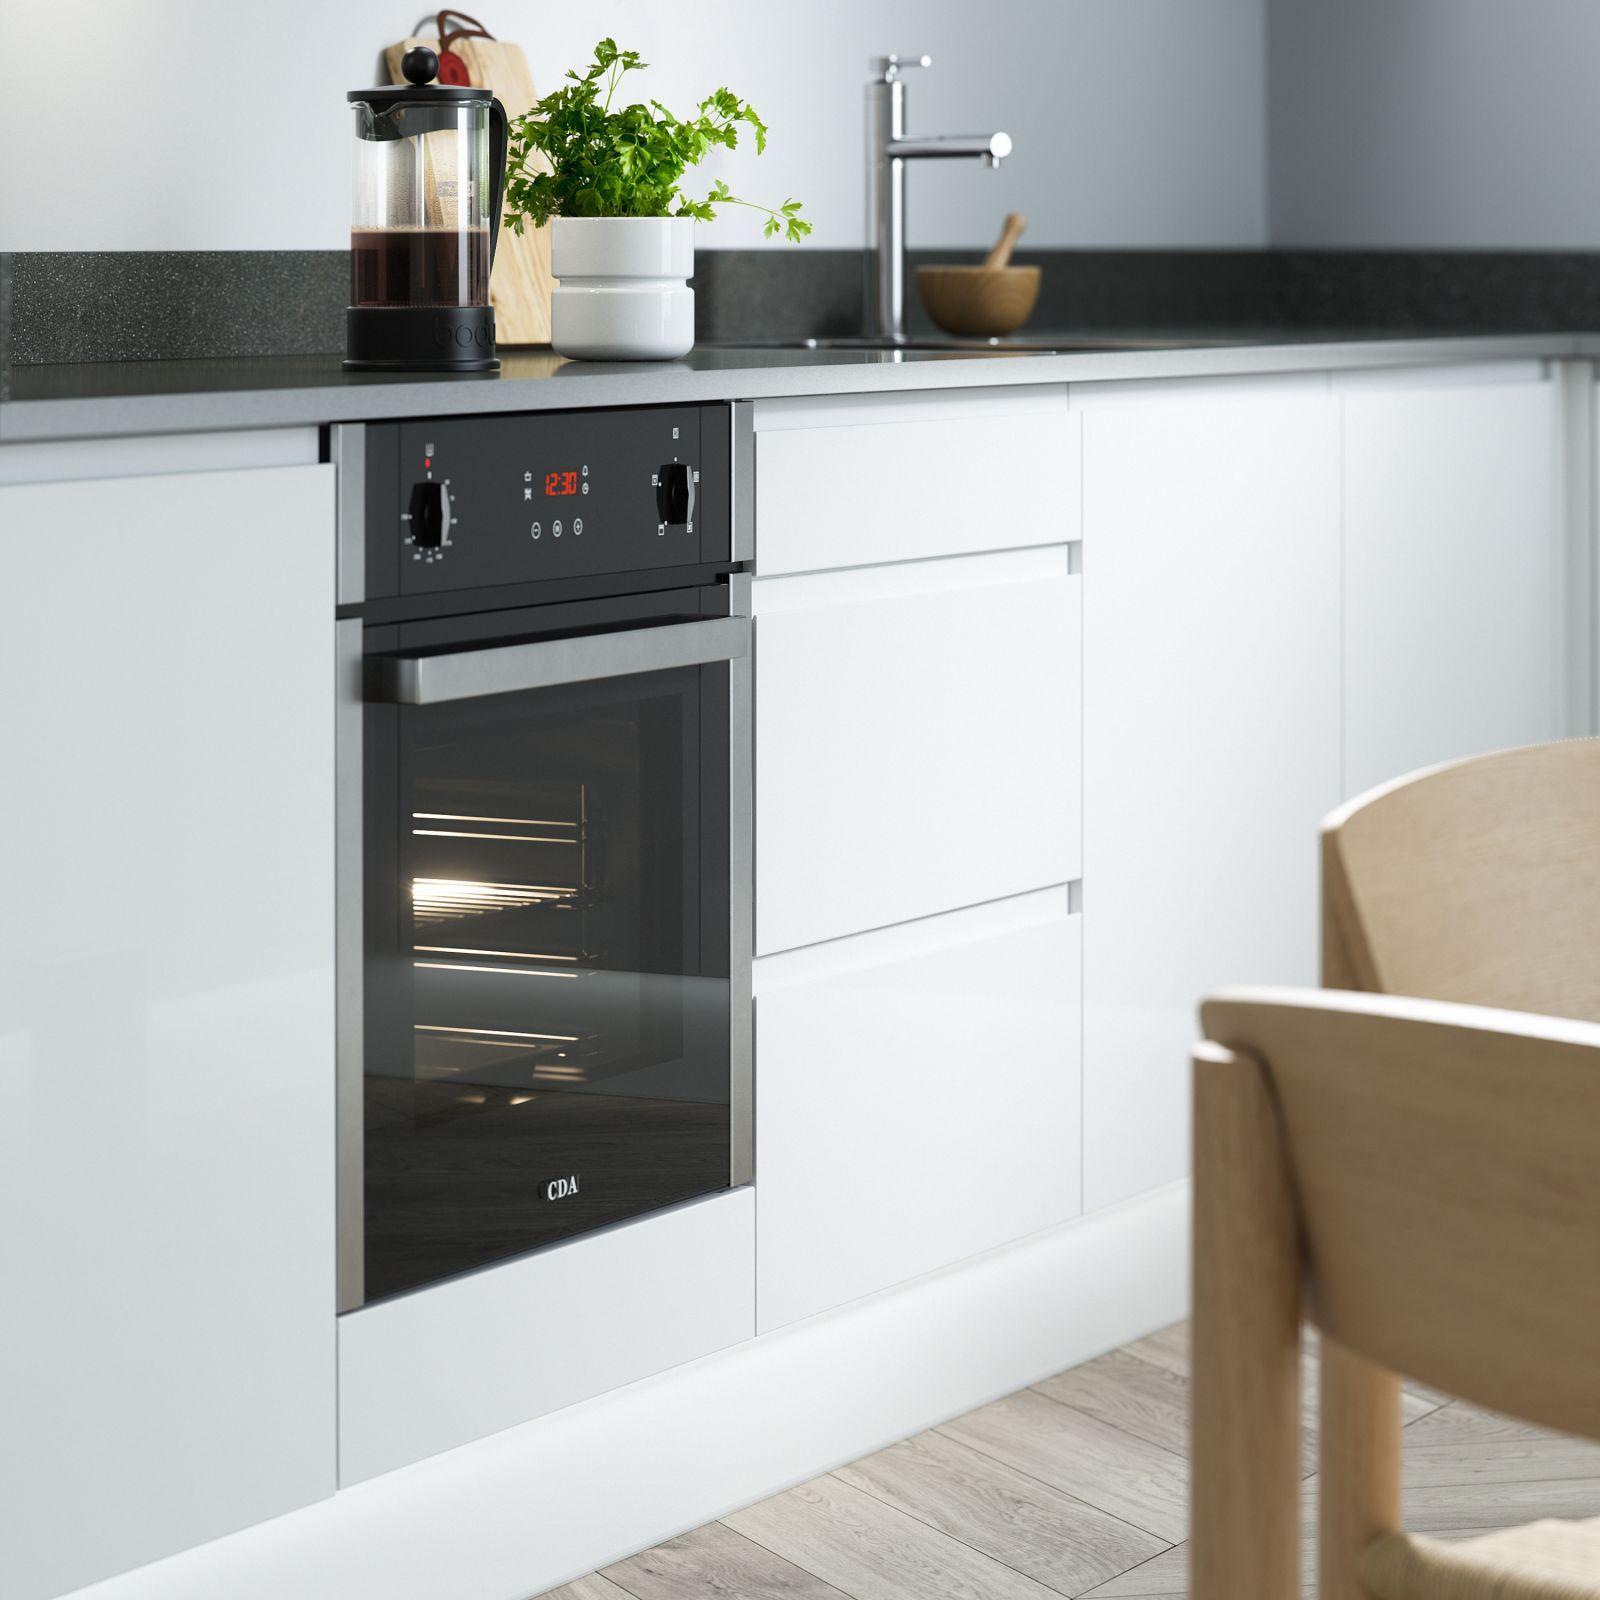 J Pull Kitchen in White Kitchen Handleless kitchen